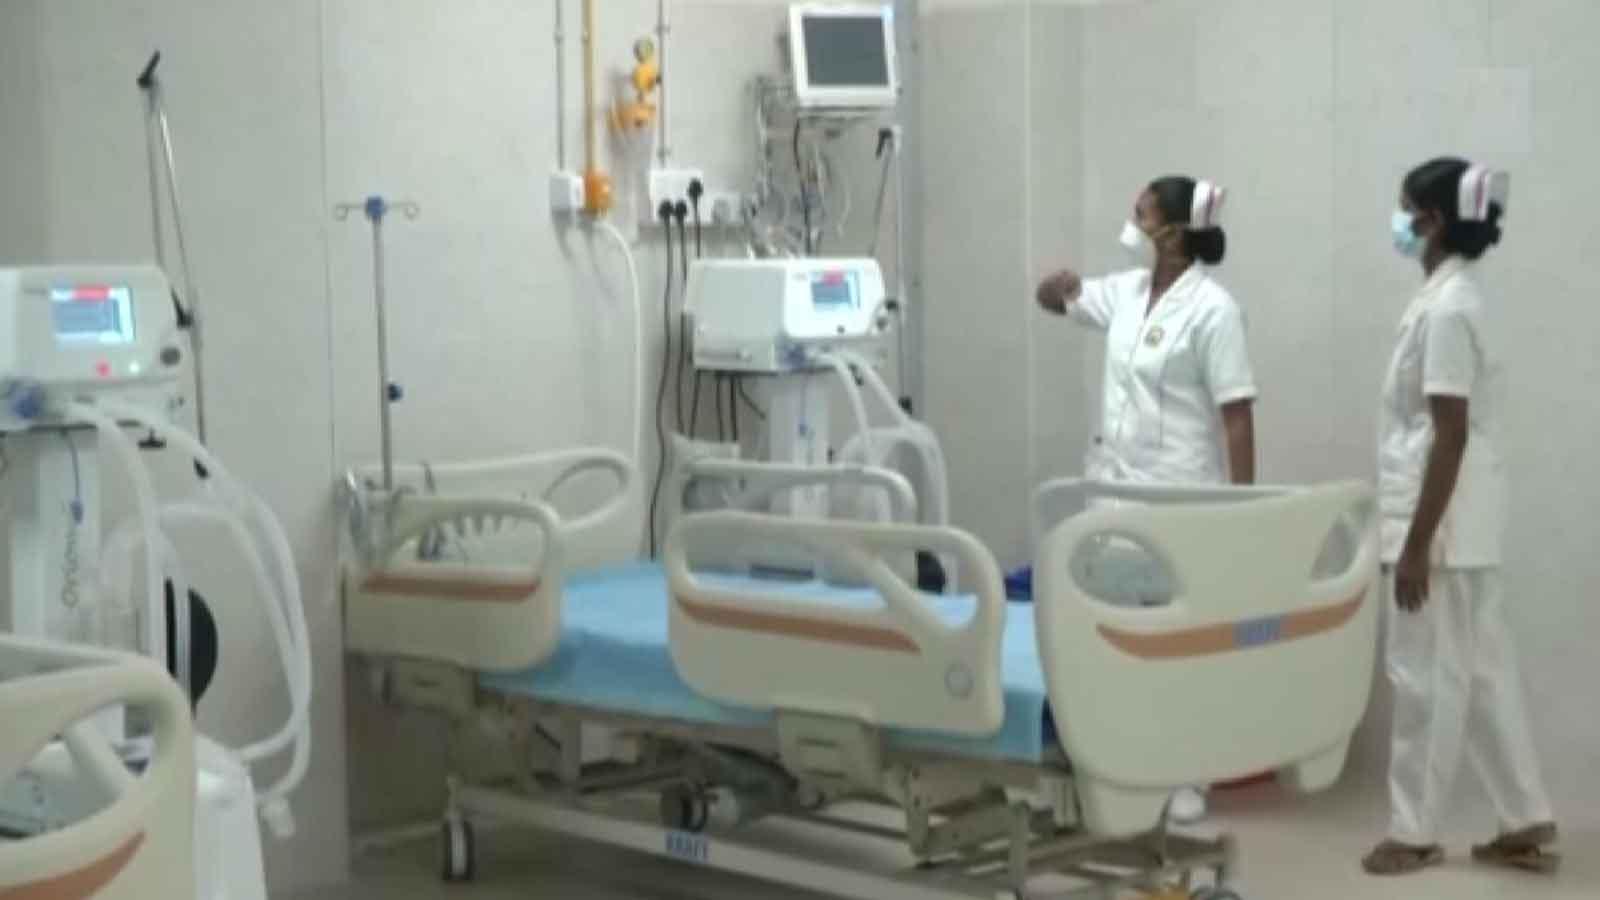 covid-19-govt-procuring-60000-ventilators-96-are-made-in-india-says-health-ministry